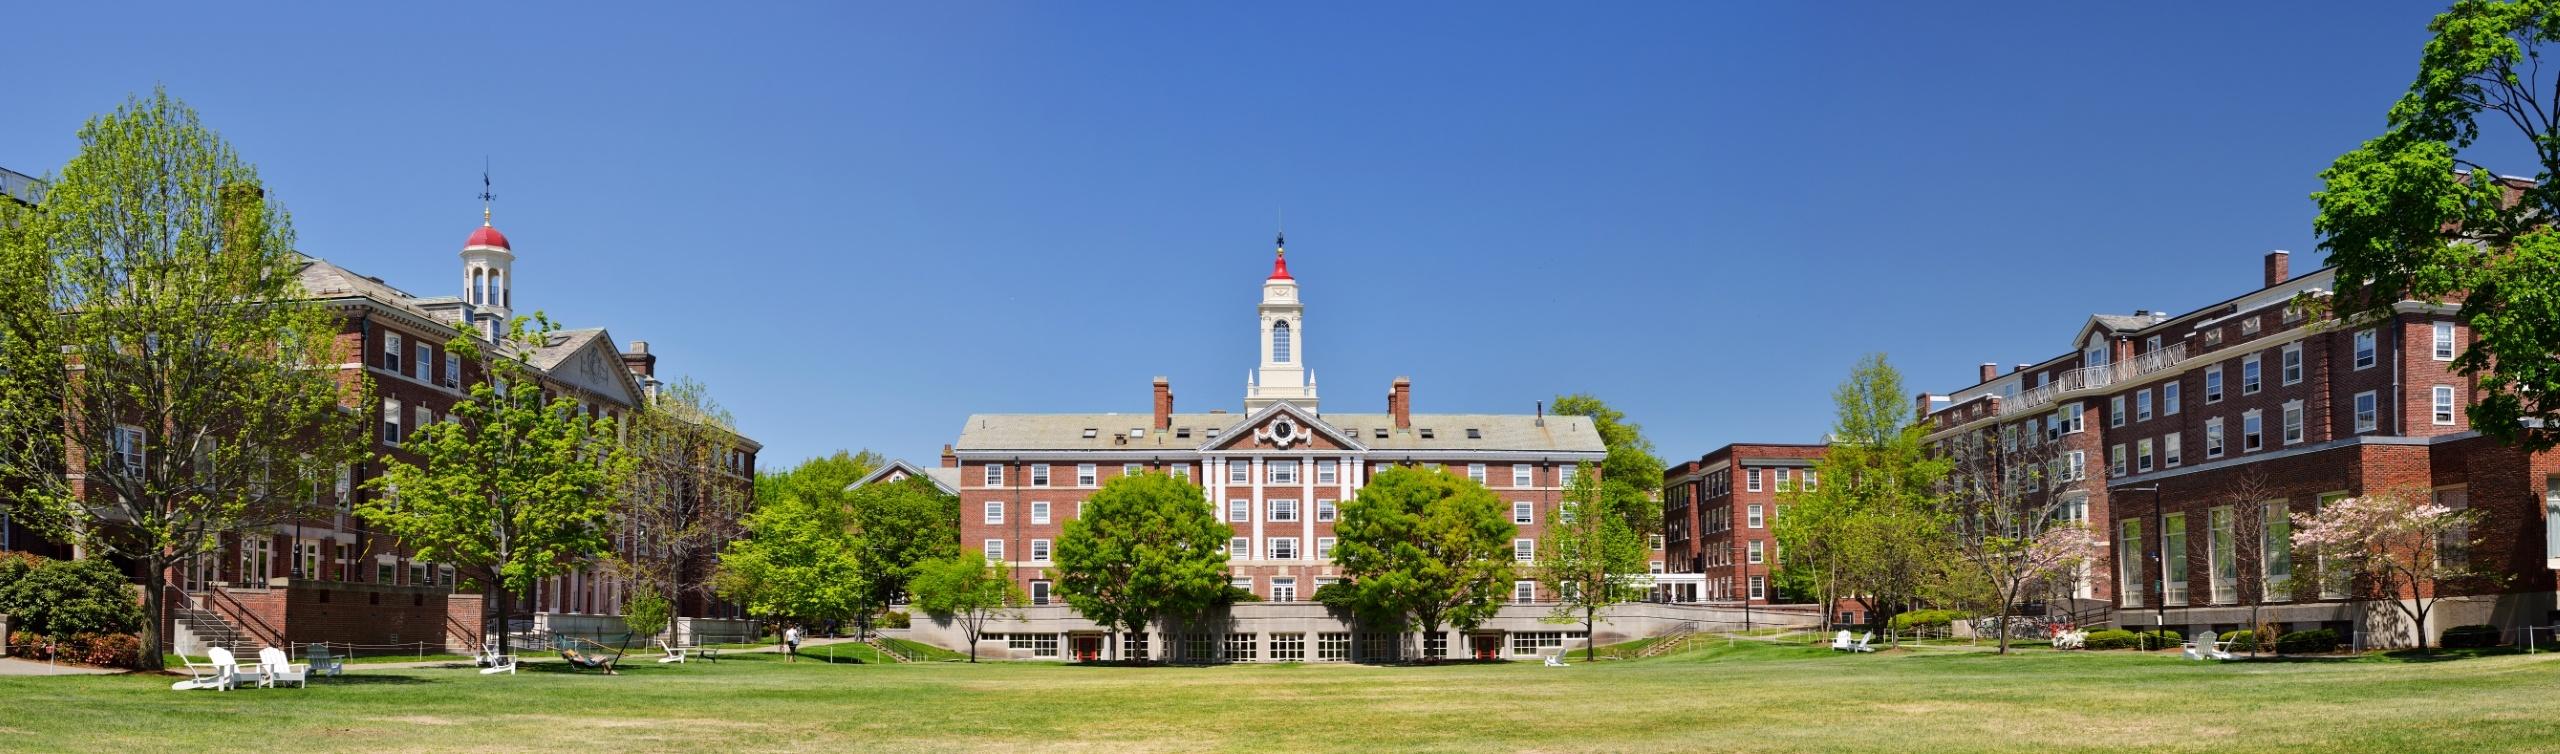 Radcliffe,Quadrangle,(the,Quad),At,Harvard,University